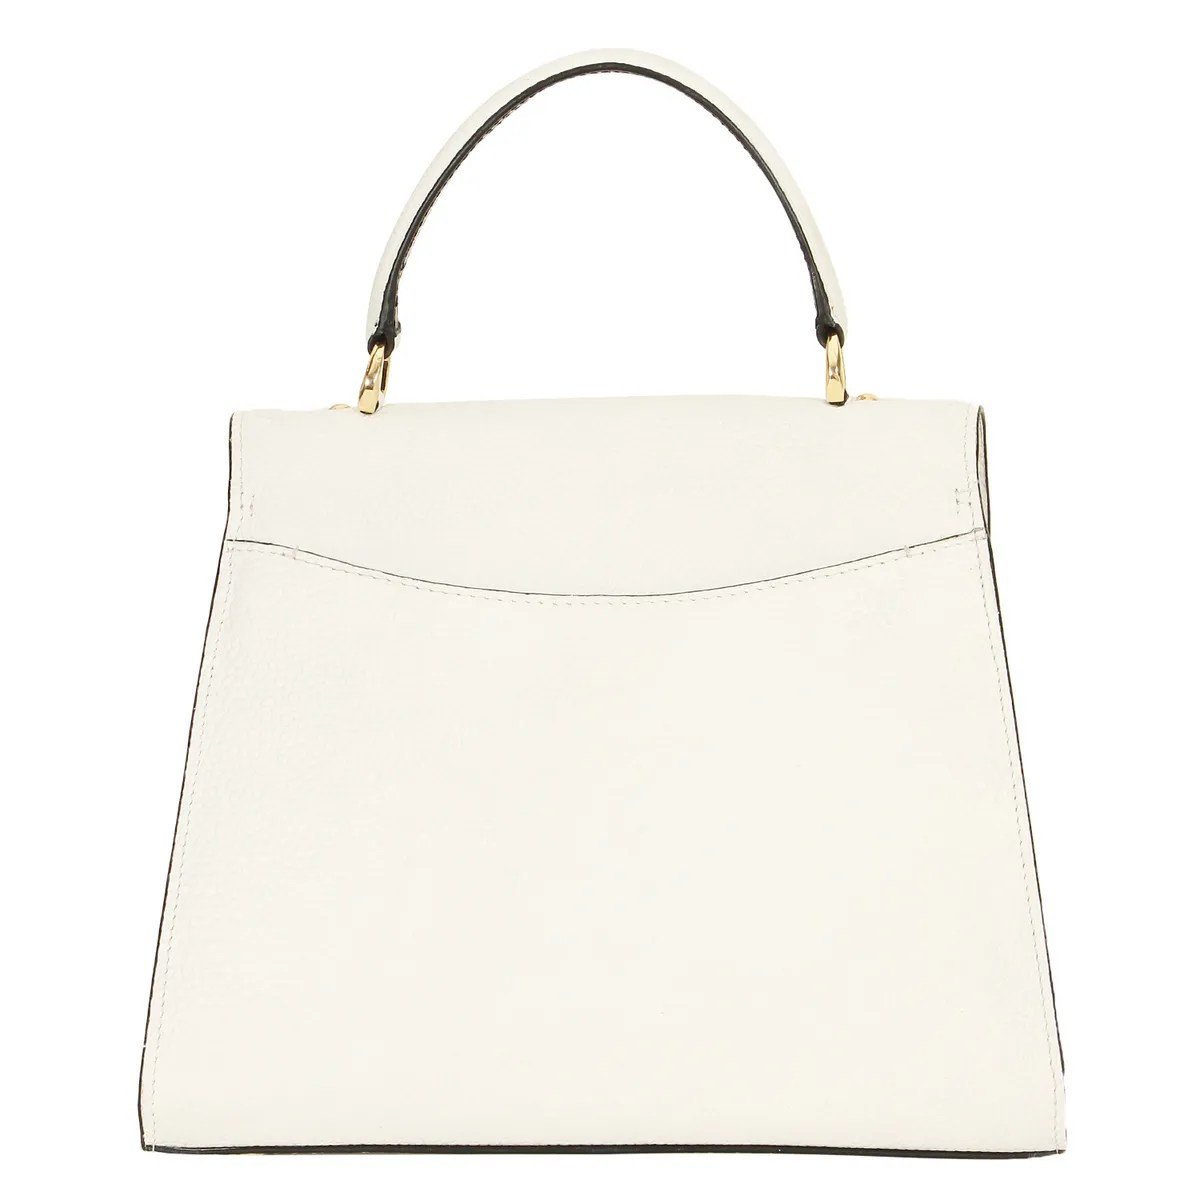 Da Milano Whiteblack Top Handle Bag